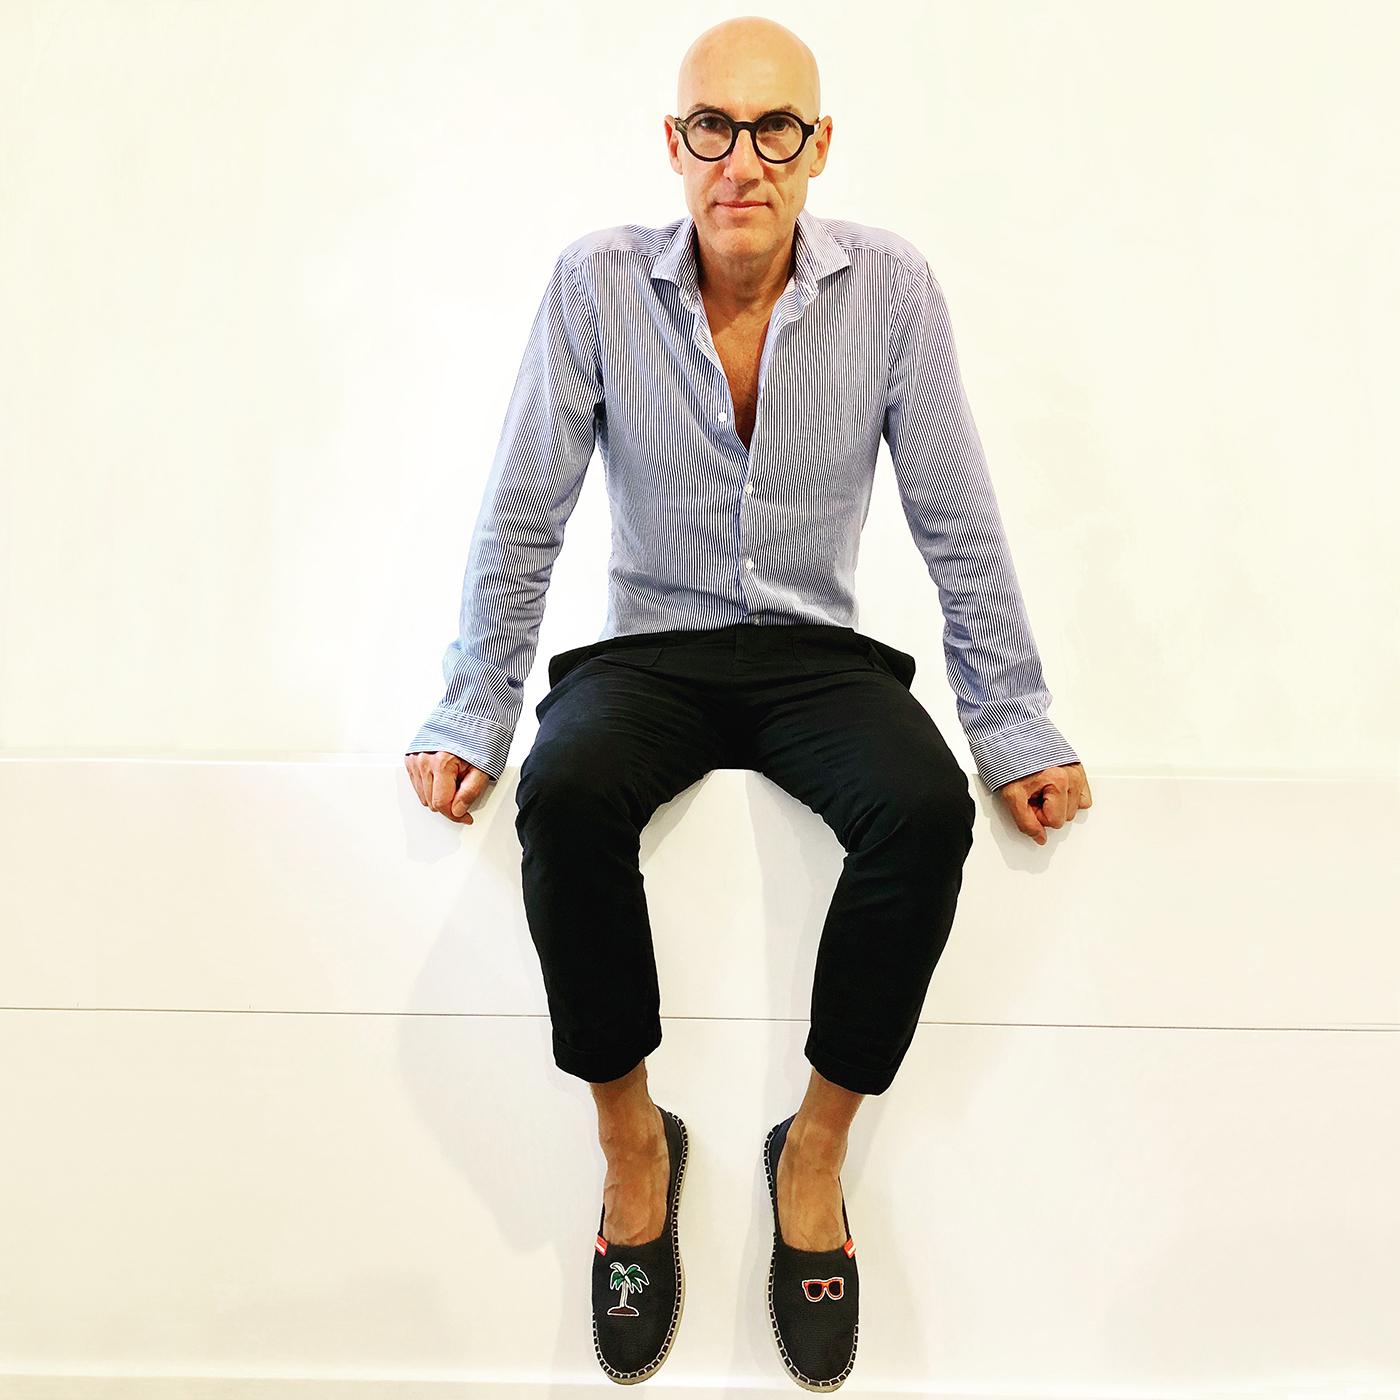 Costantino Vignato - my style